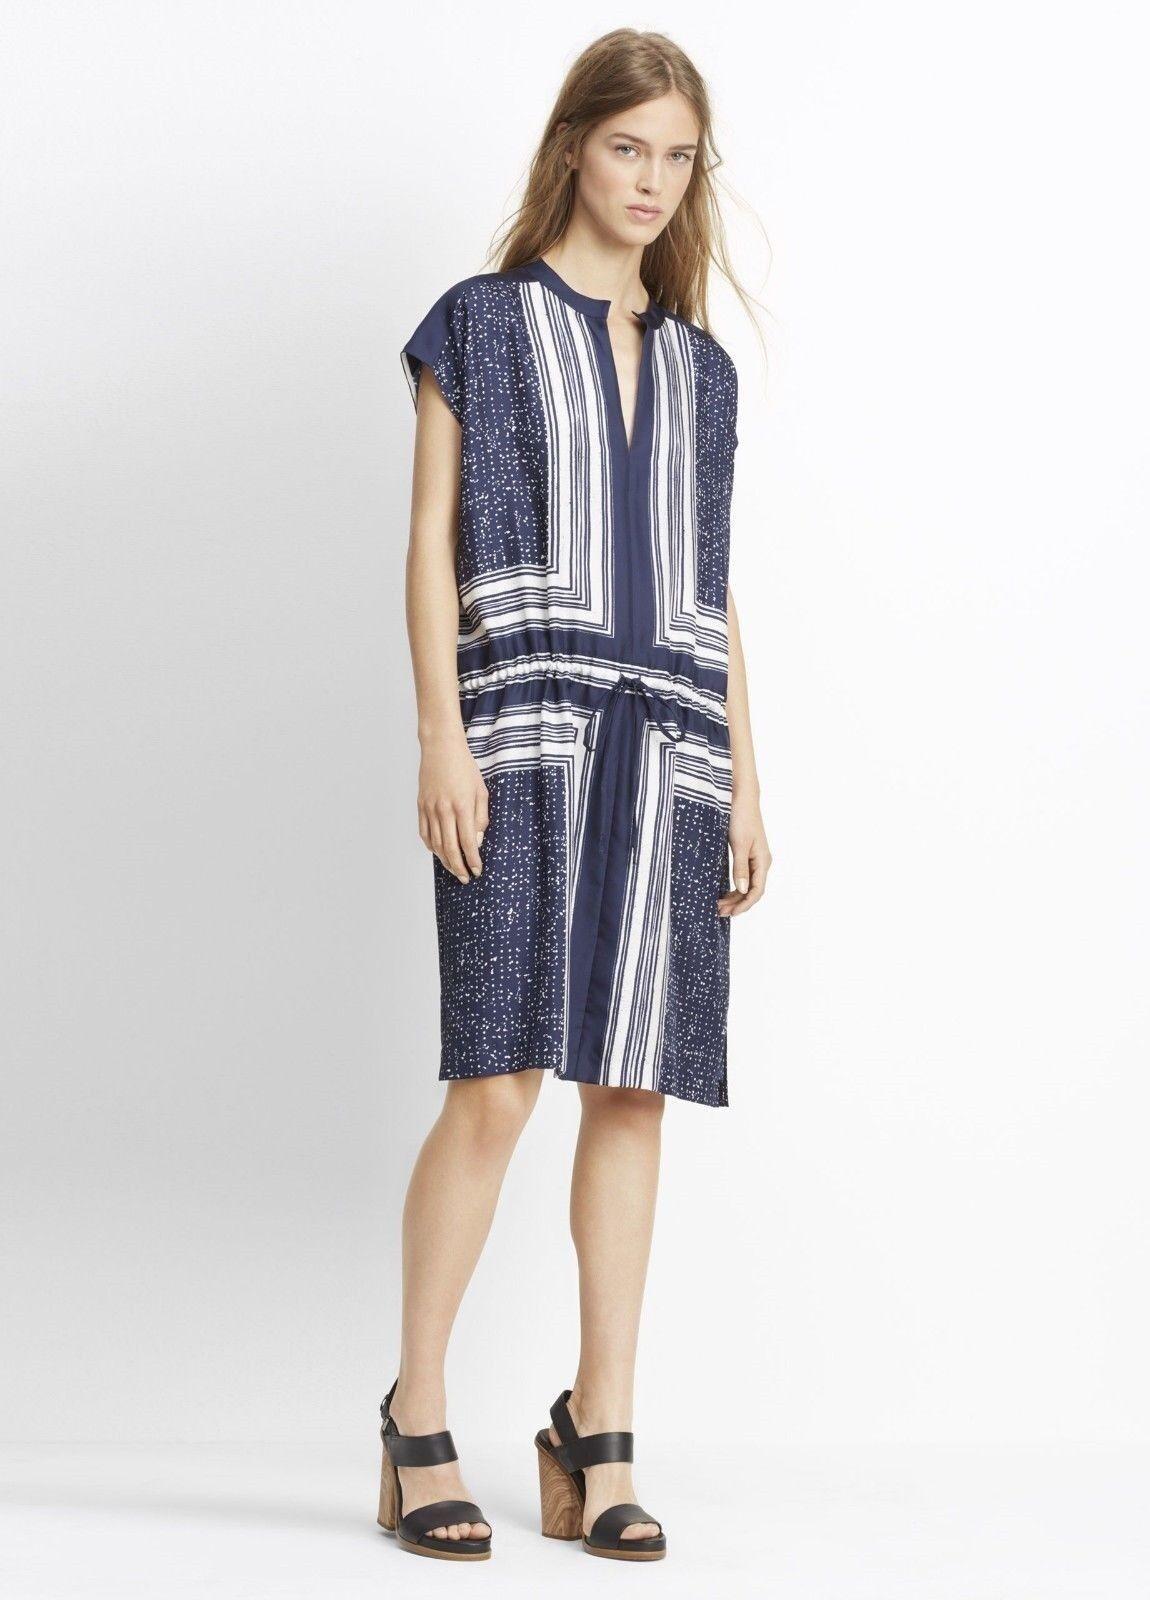 Vince Scarf Print Popover Drawstring silk Navy White Navy Dress NWT XS L